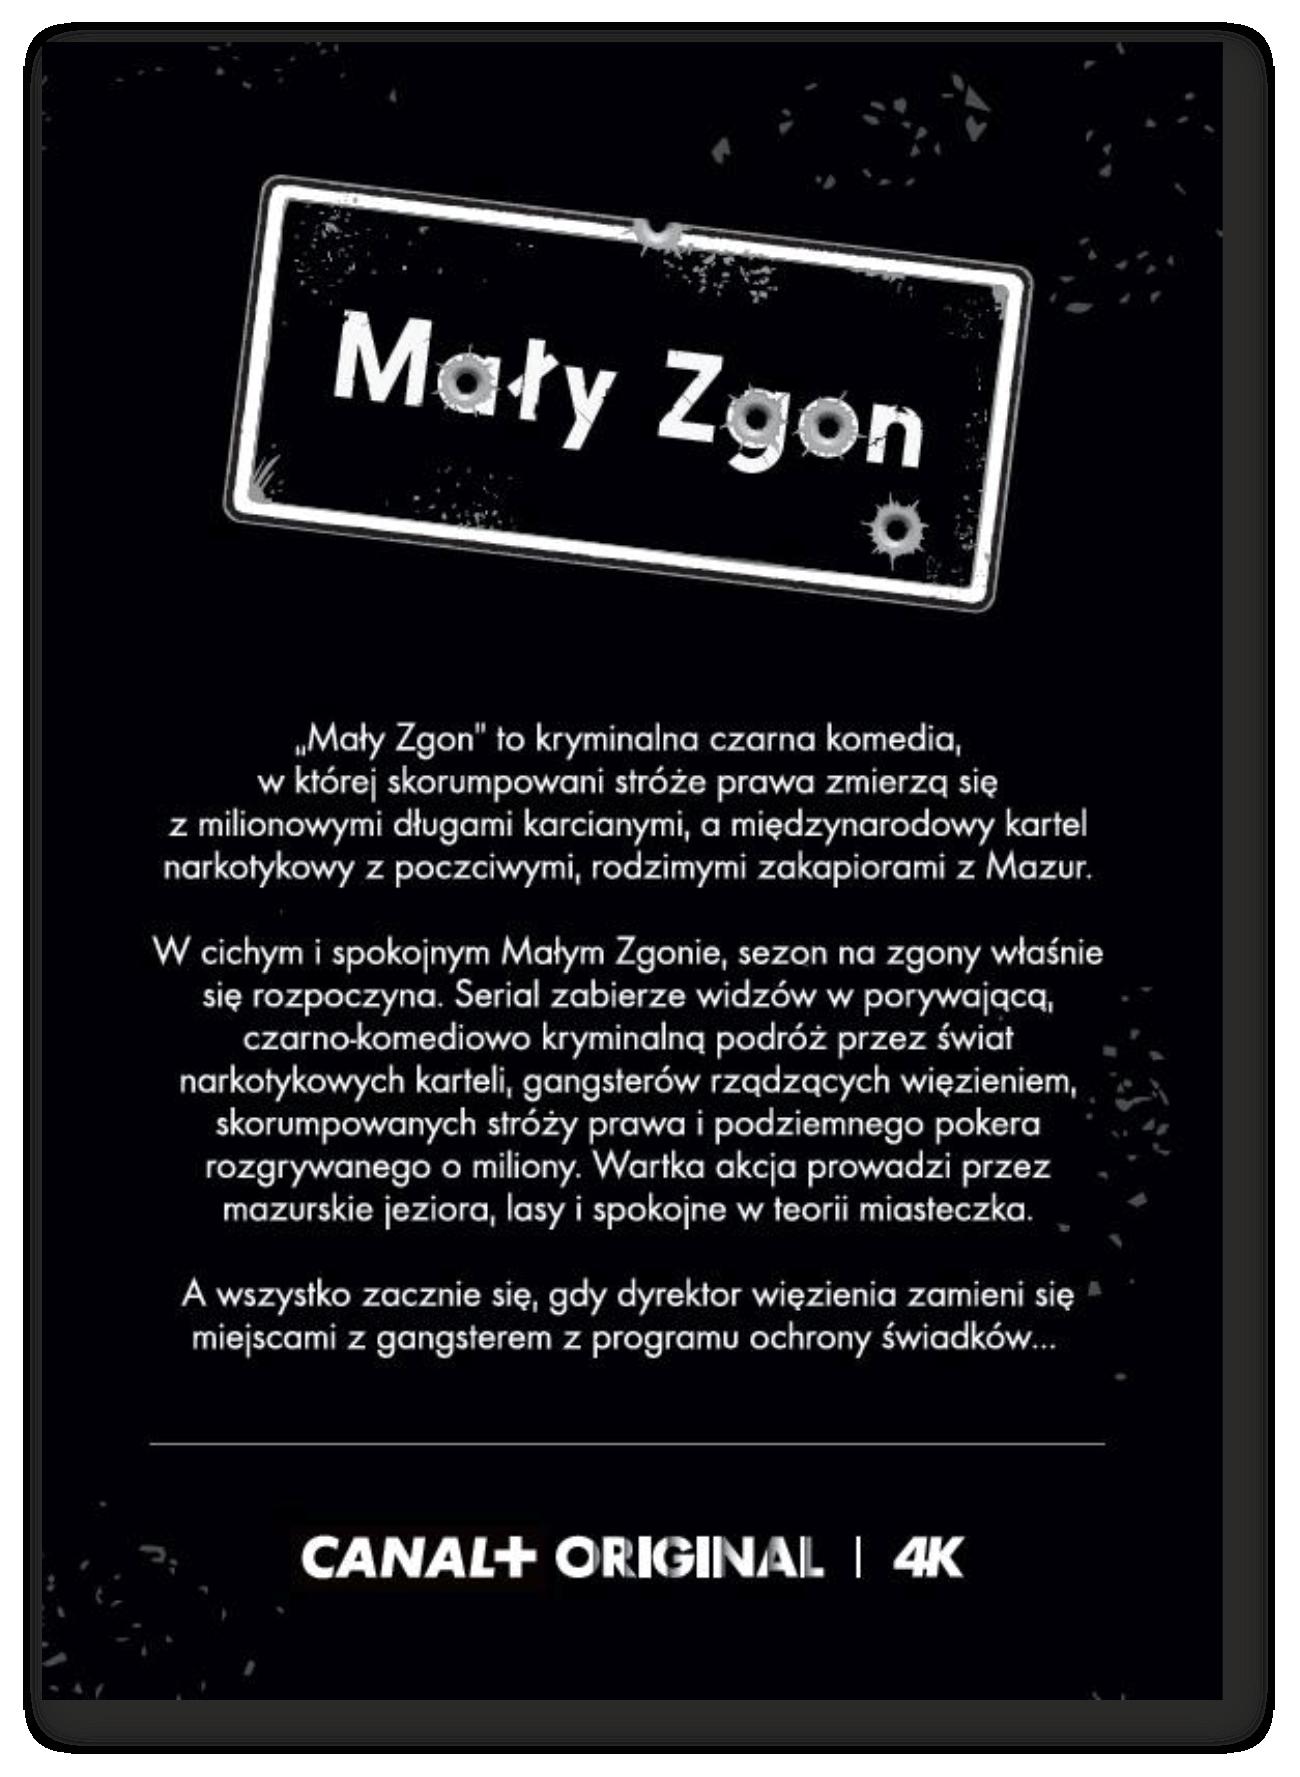 reklama_maly_zgon_2.jpg